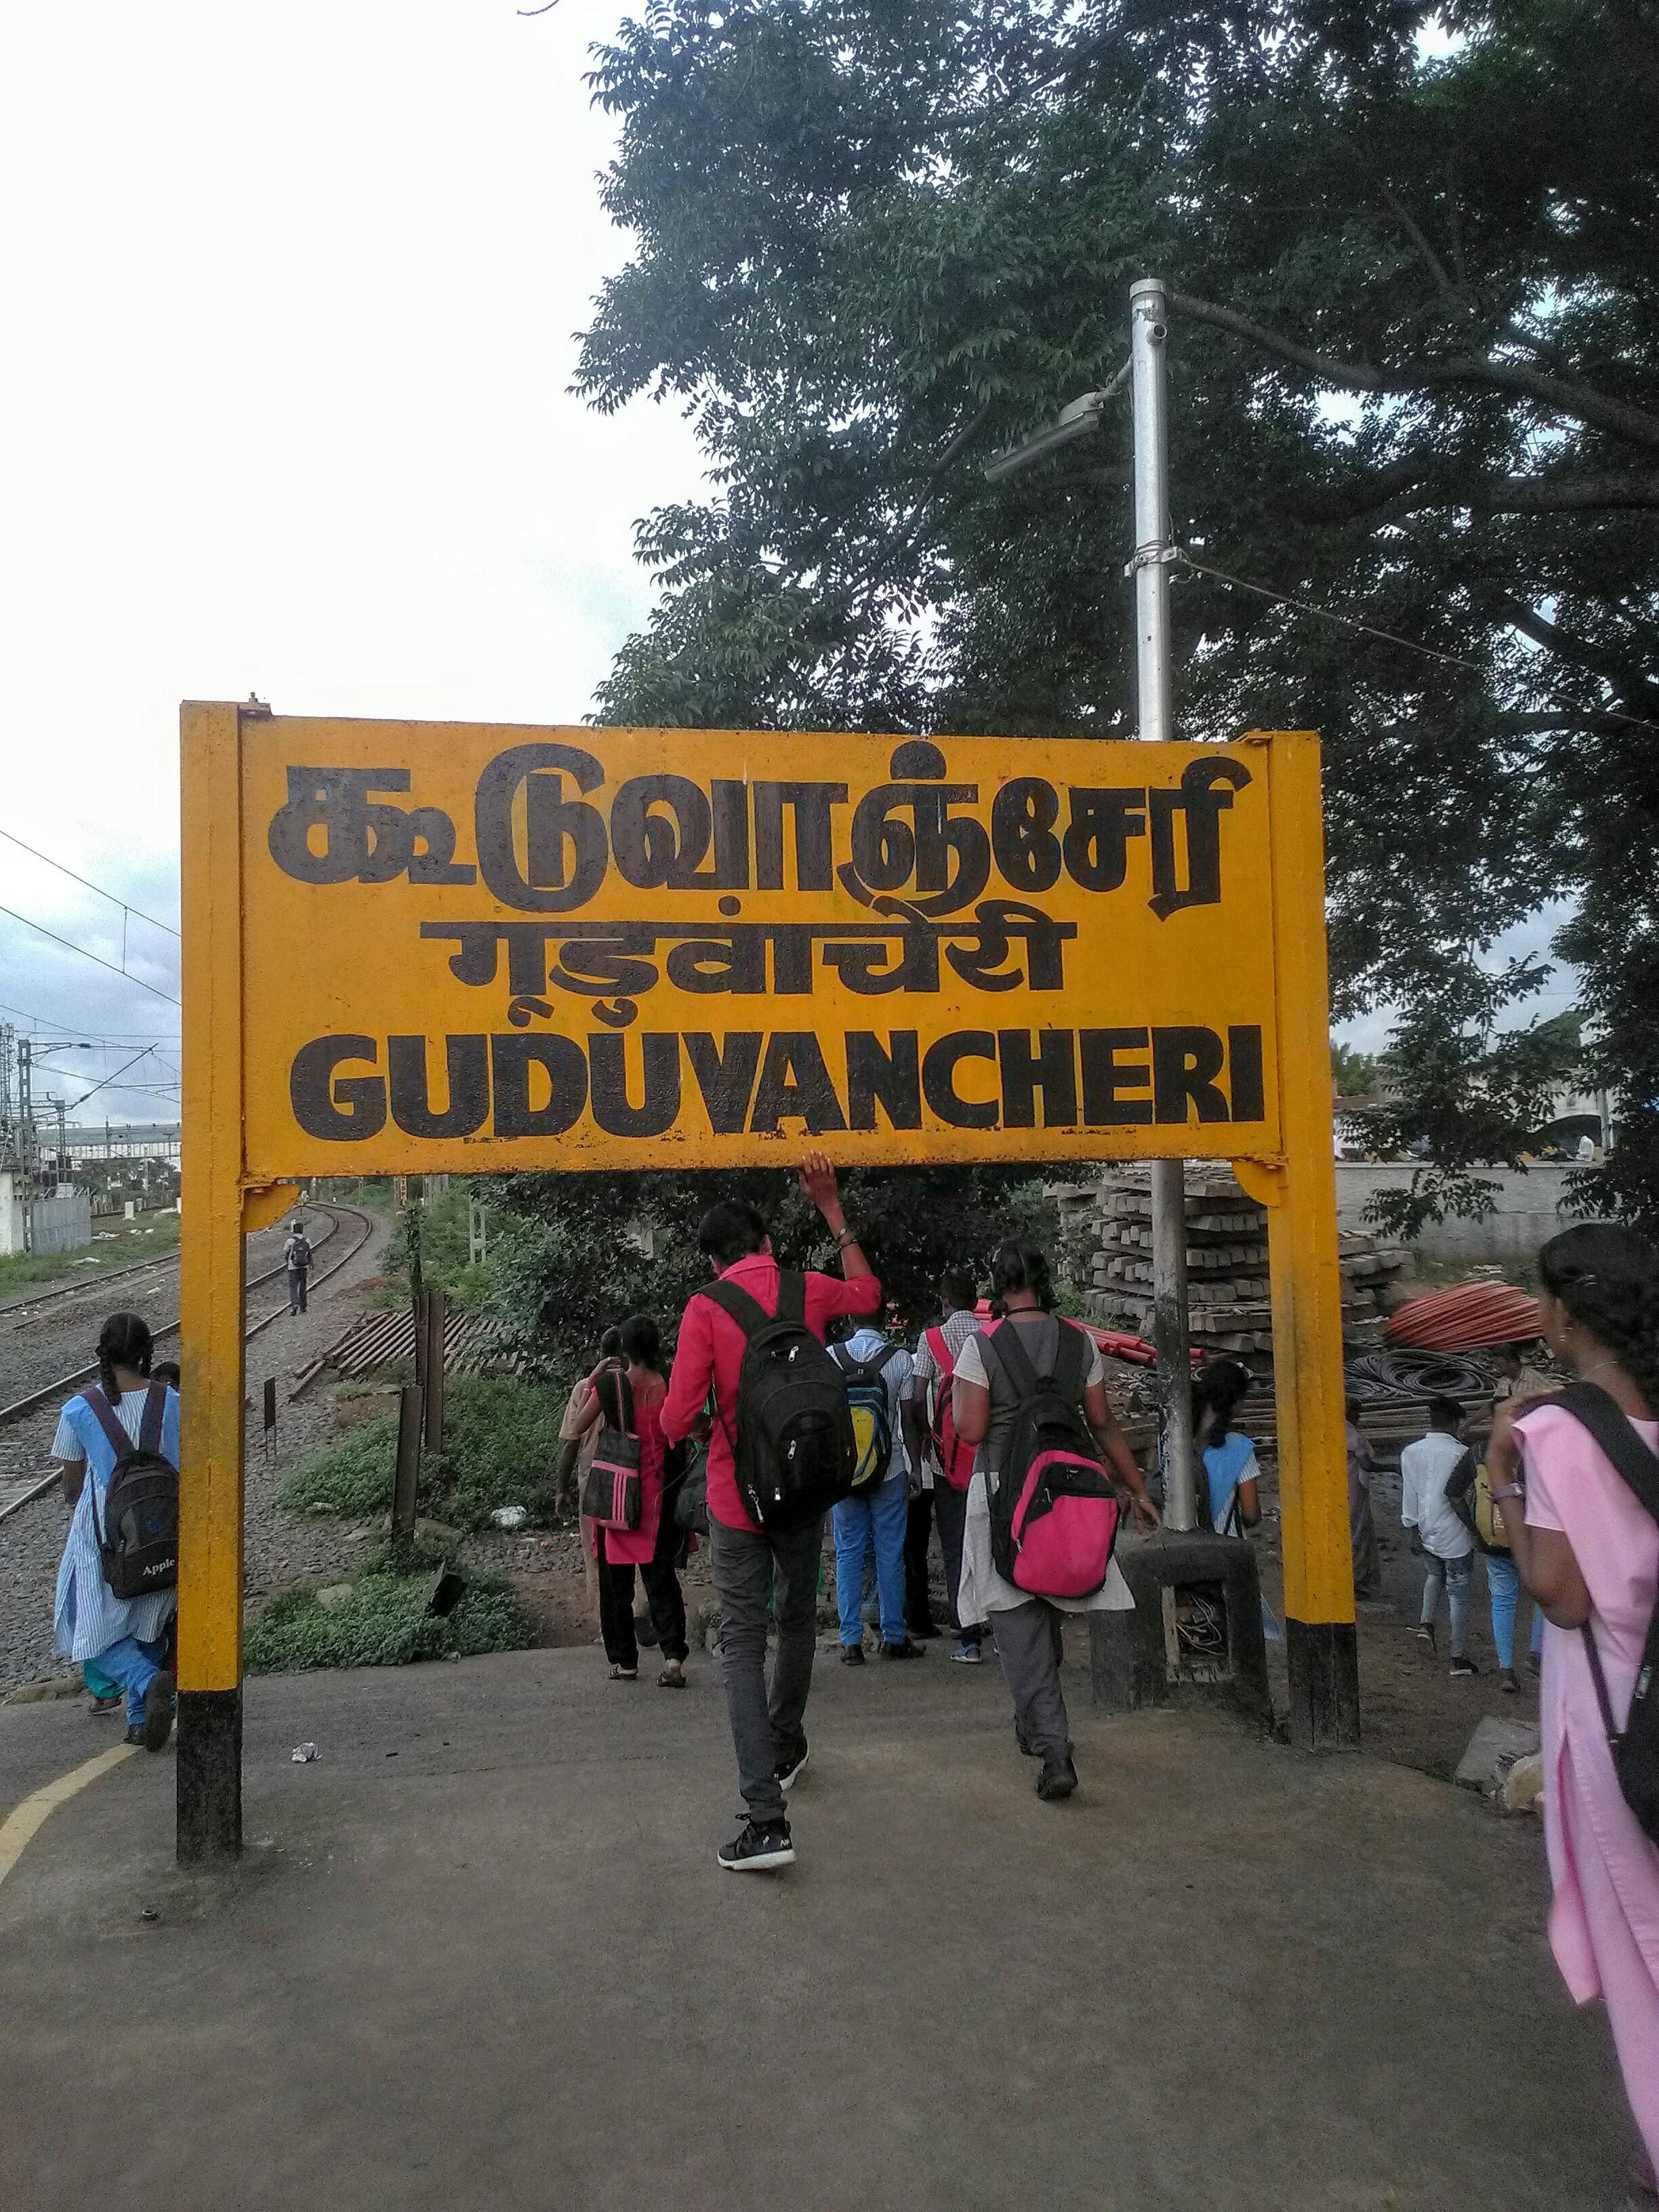 Guduvancheri railway station - Wikipedia